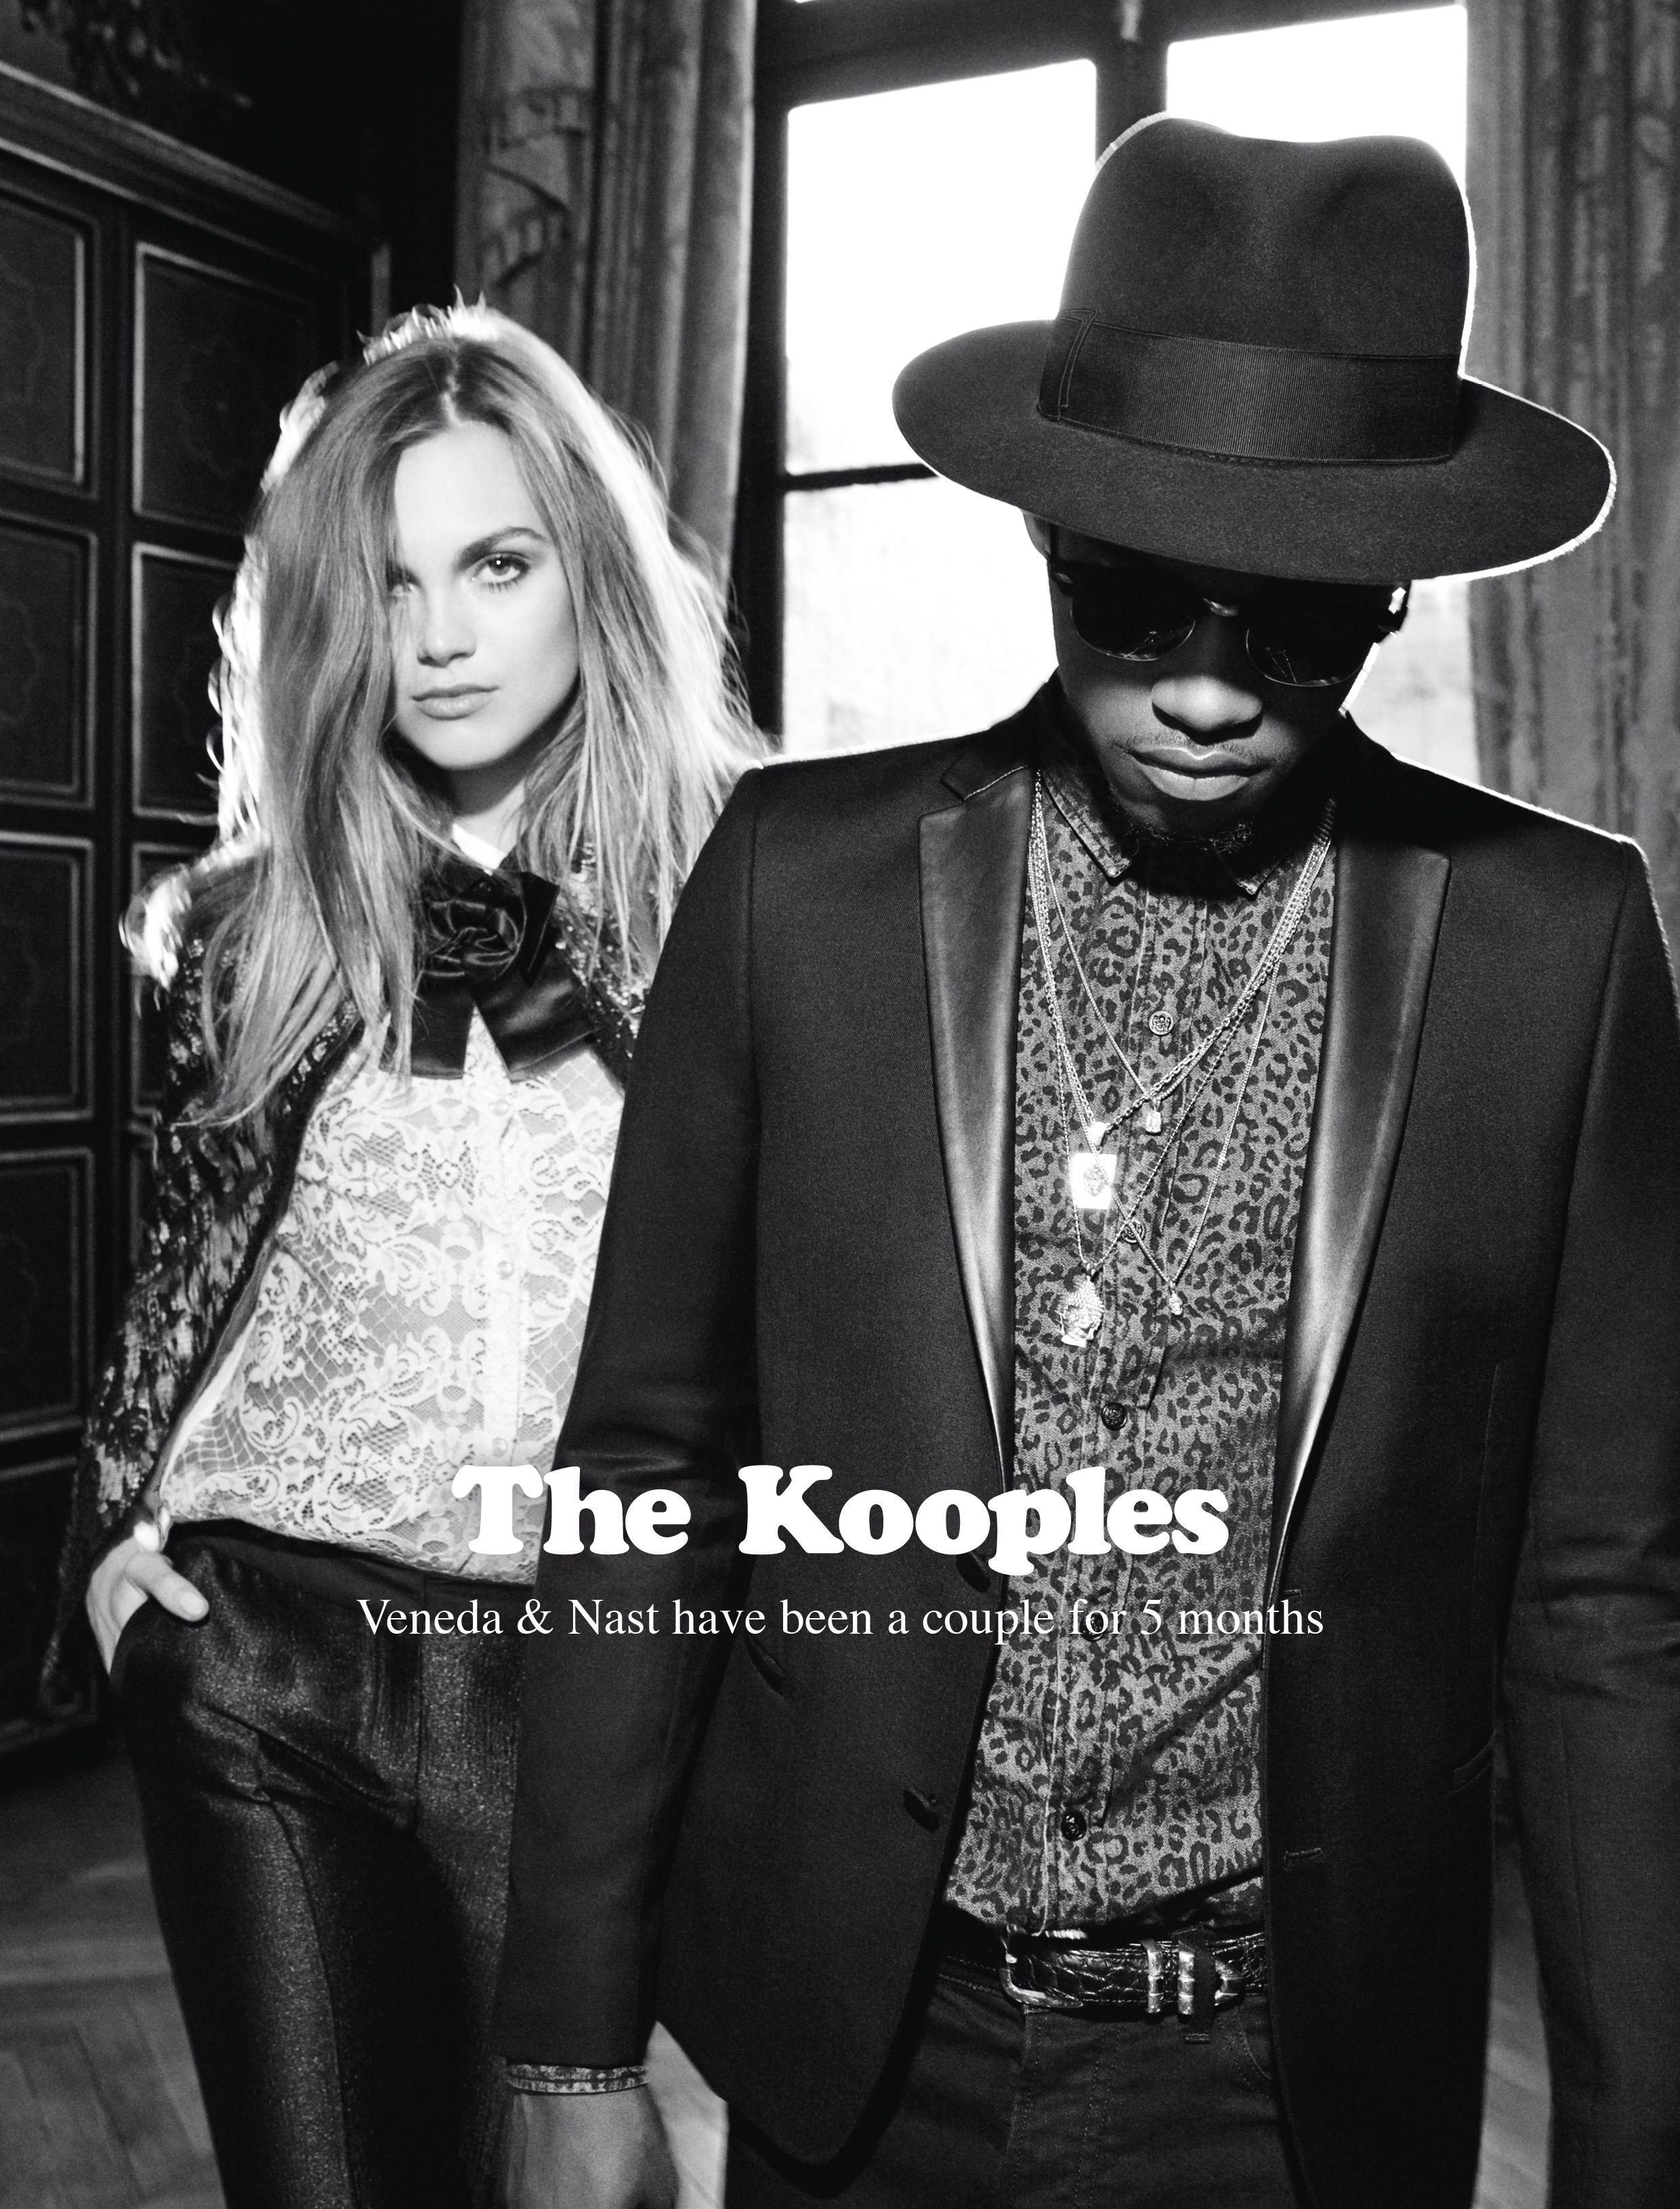 d4a289b33a5 Veneda & Nast for The Kooples FW13 #thekooples #campaign | Stylish ...